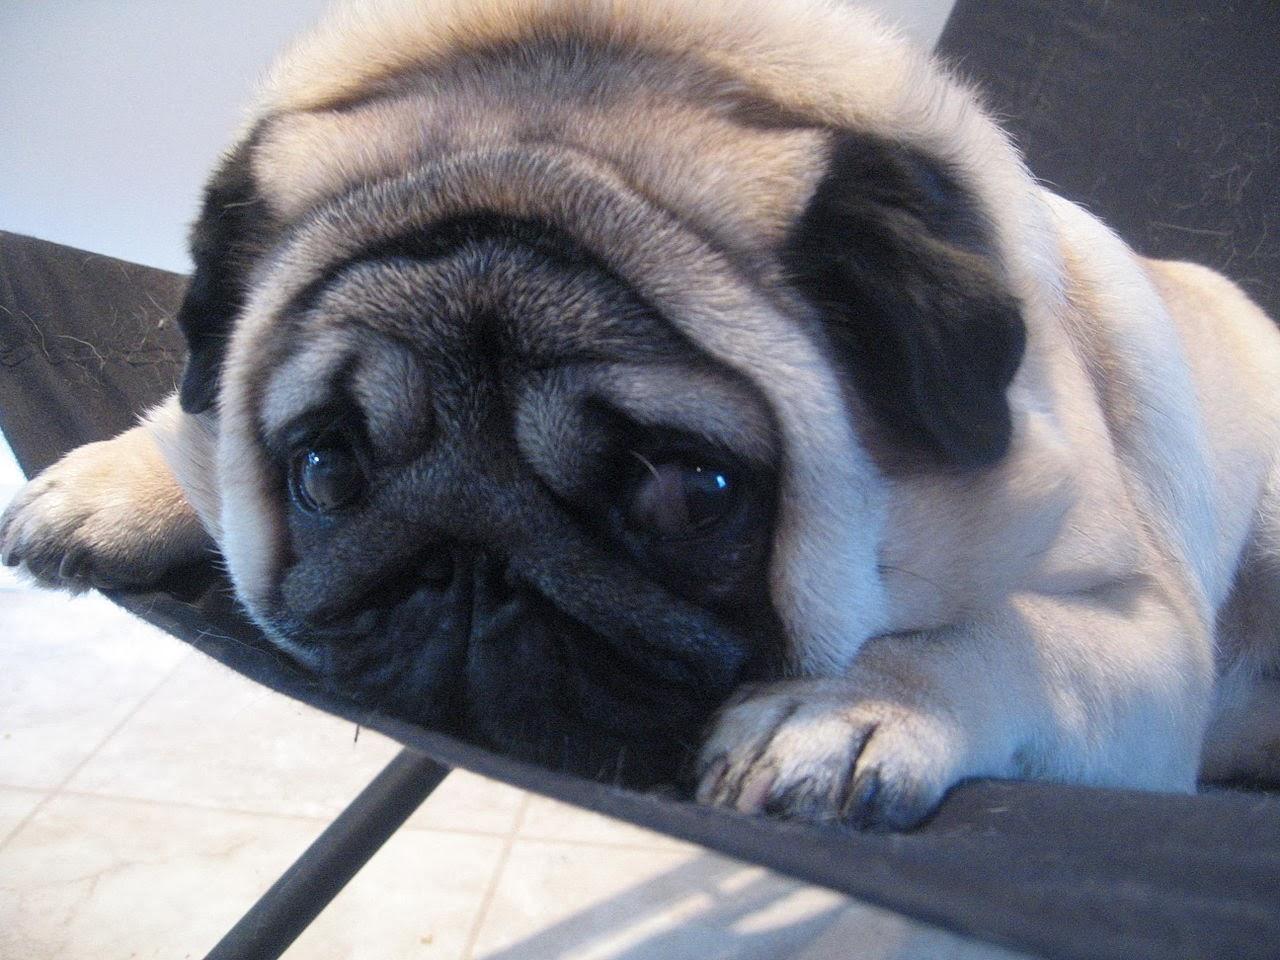 Grace Elliot - blog.: Pug Dogs and Things Pugnacious